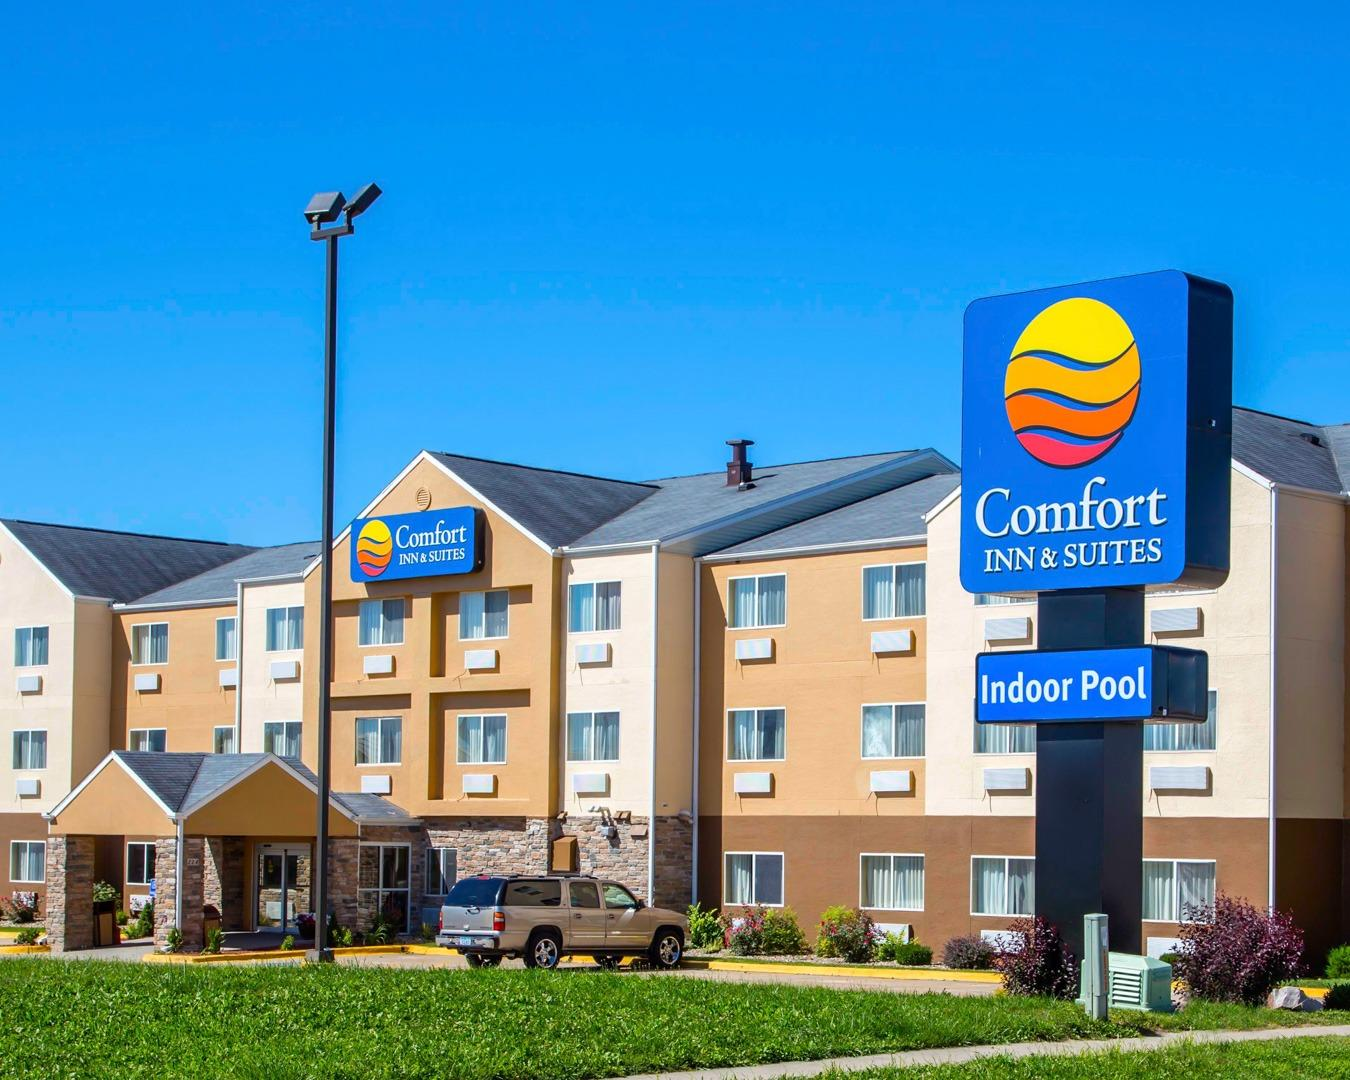 comfort inn suites in coralville ia 319 337 8. Black Bedroom Furniture Sets. Home Design Ideas